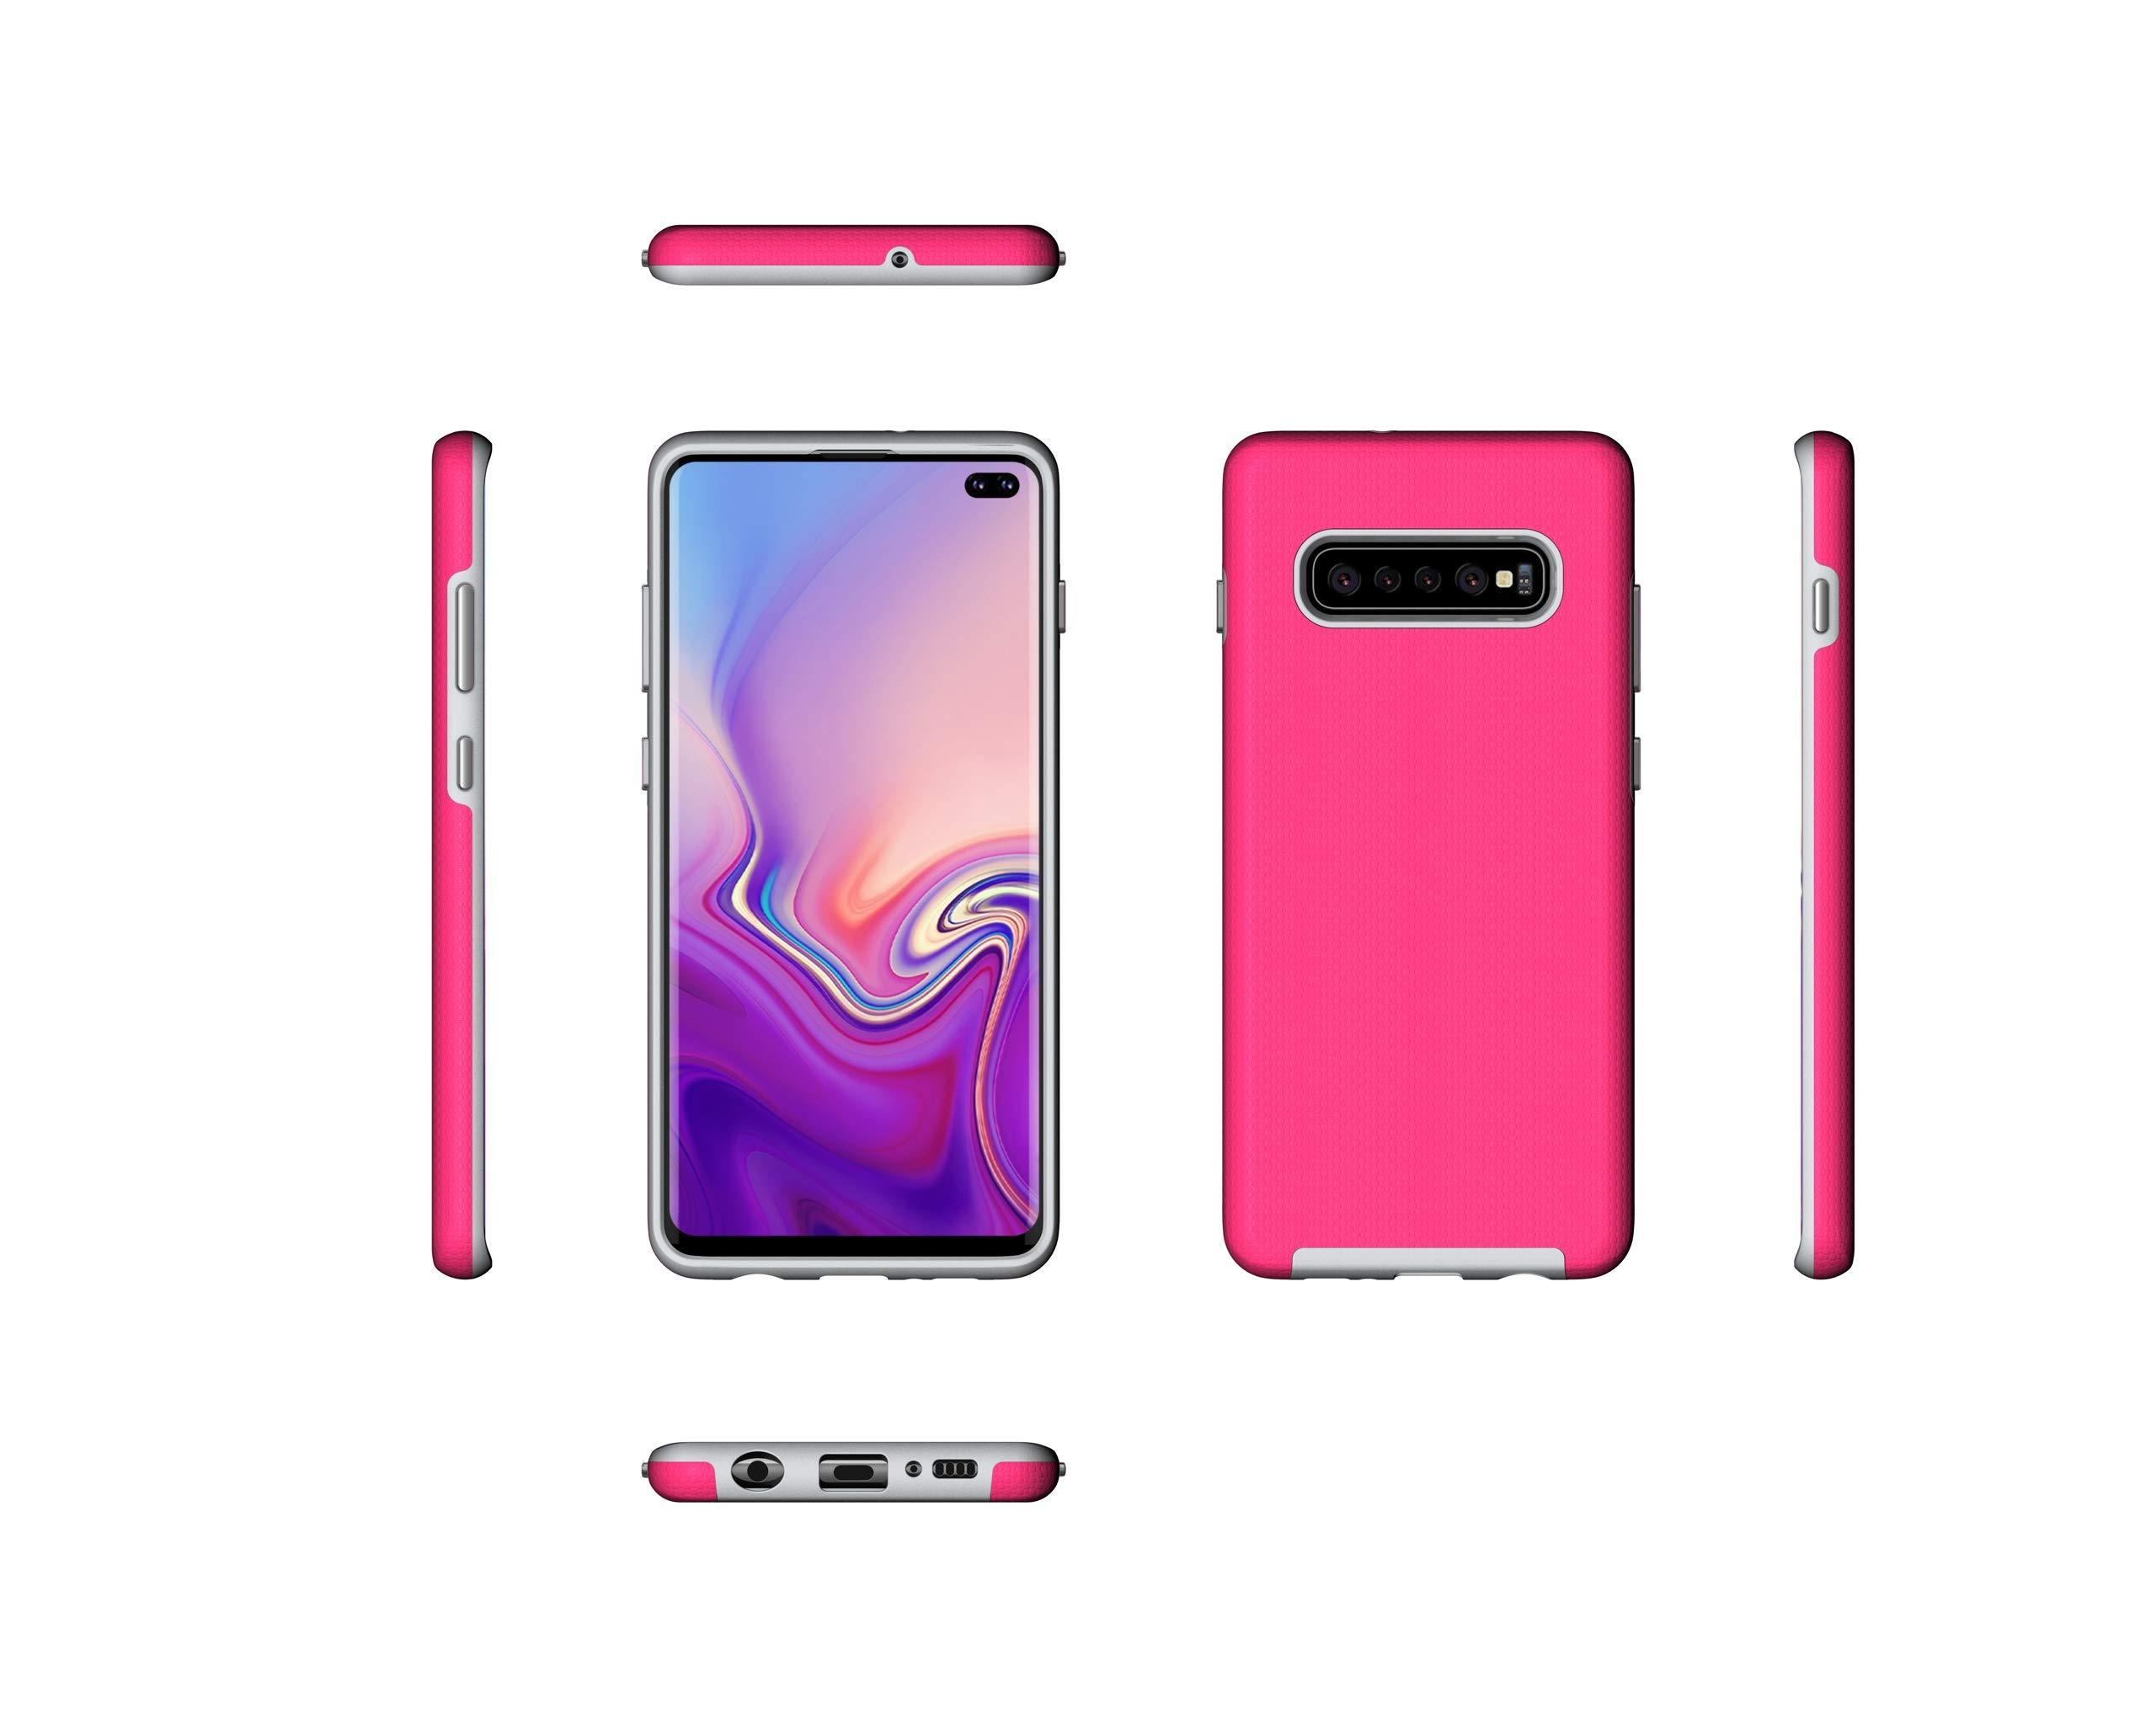 NOMO Galaxy S10 Case,Samsung S10 Hybrid Defender Armor Case,Dual Layer Protective Phone Case,Full Body Rugged Case,Non-Slip Drop Protection Shock Proof Case for Samsung Galaxy S10 Hot Pink by NOMO (Image #5)